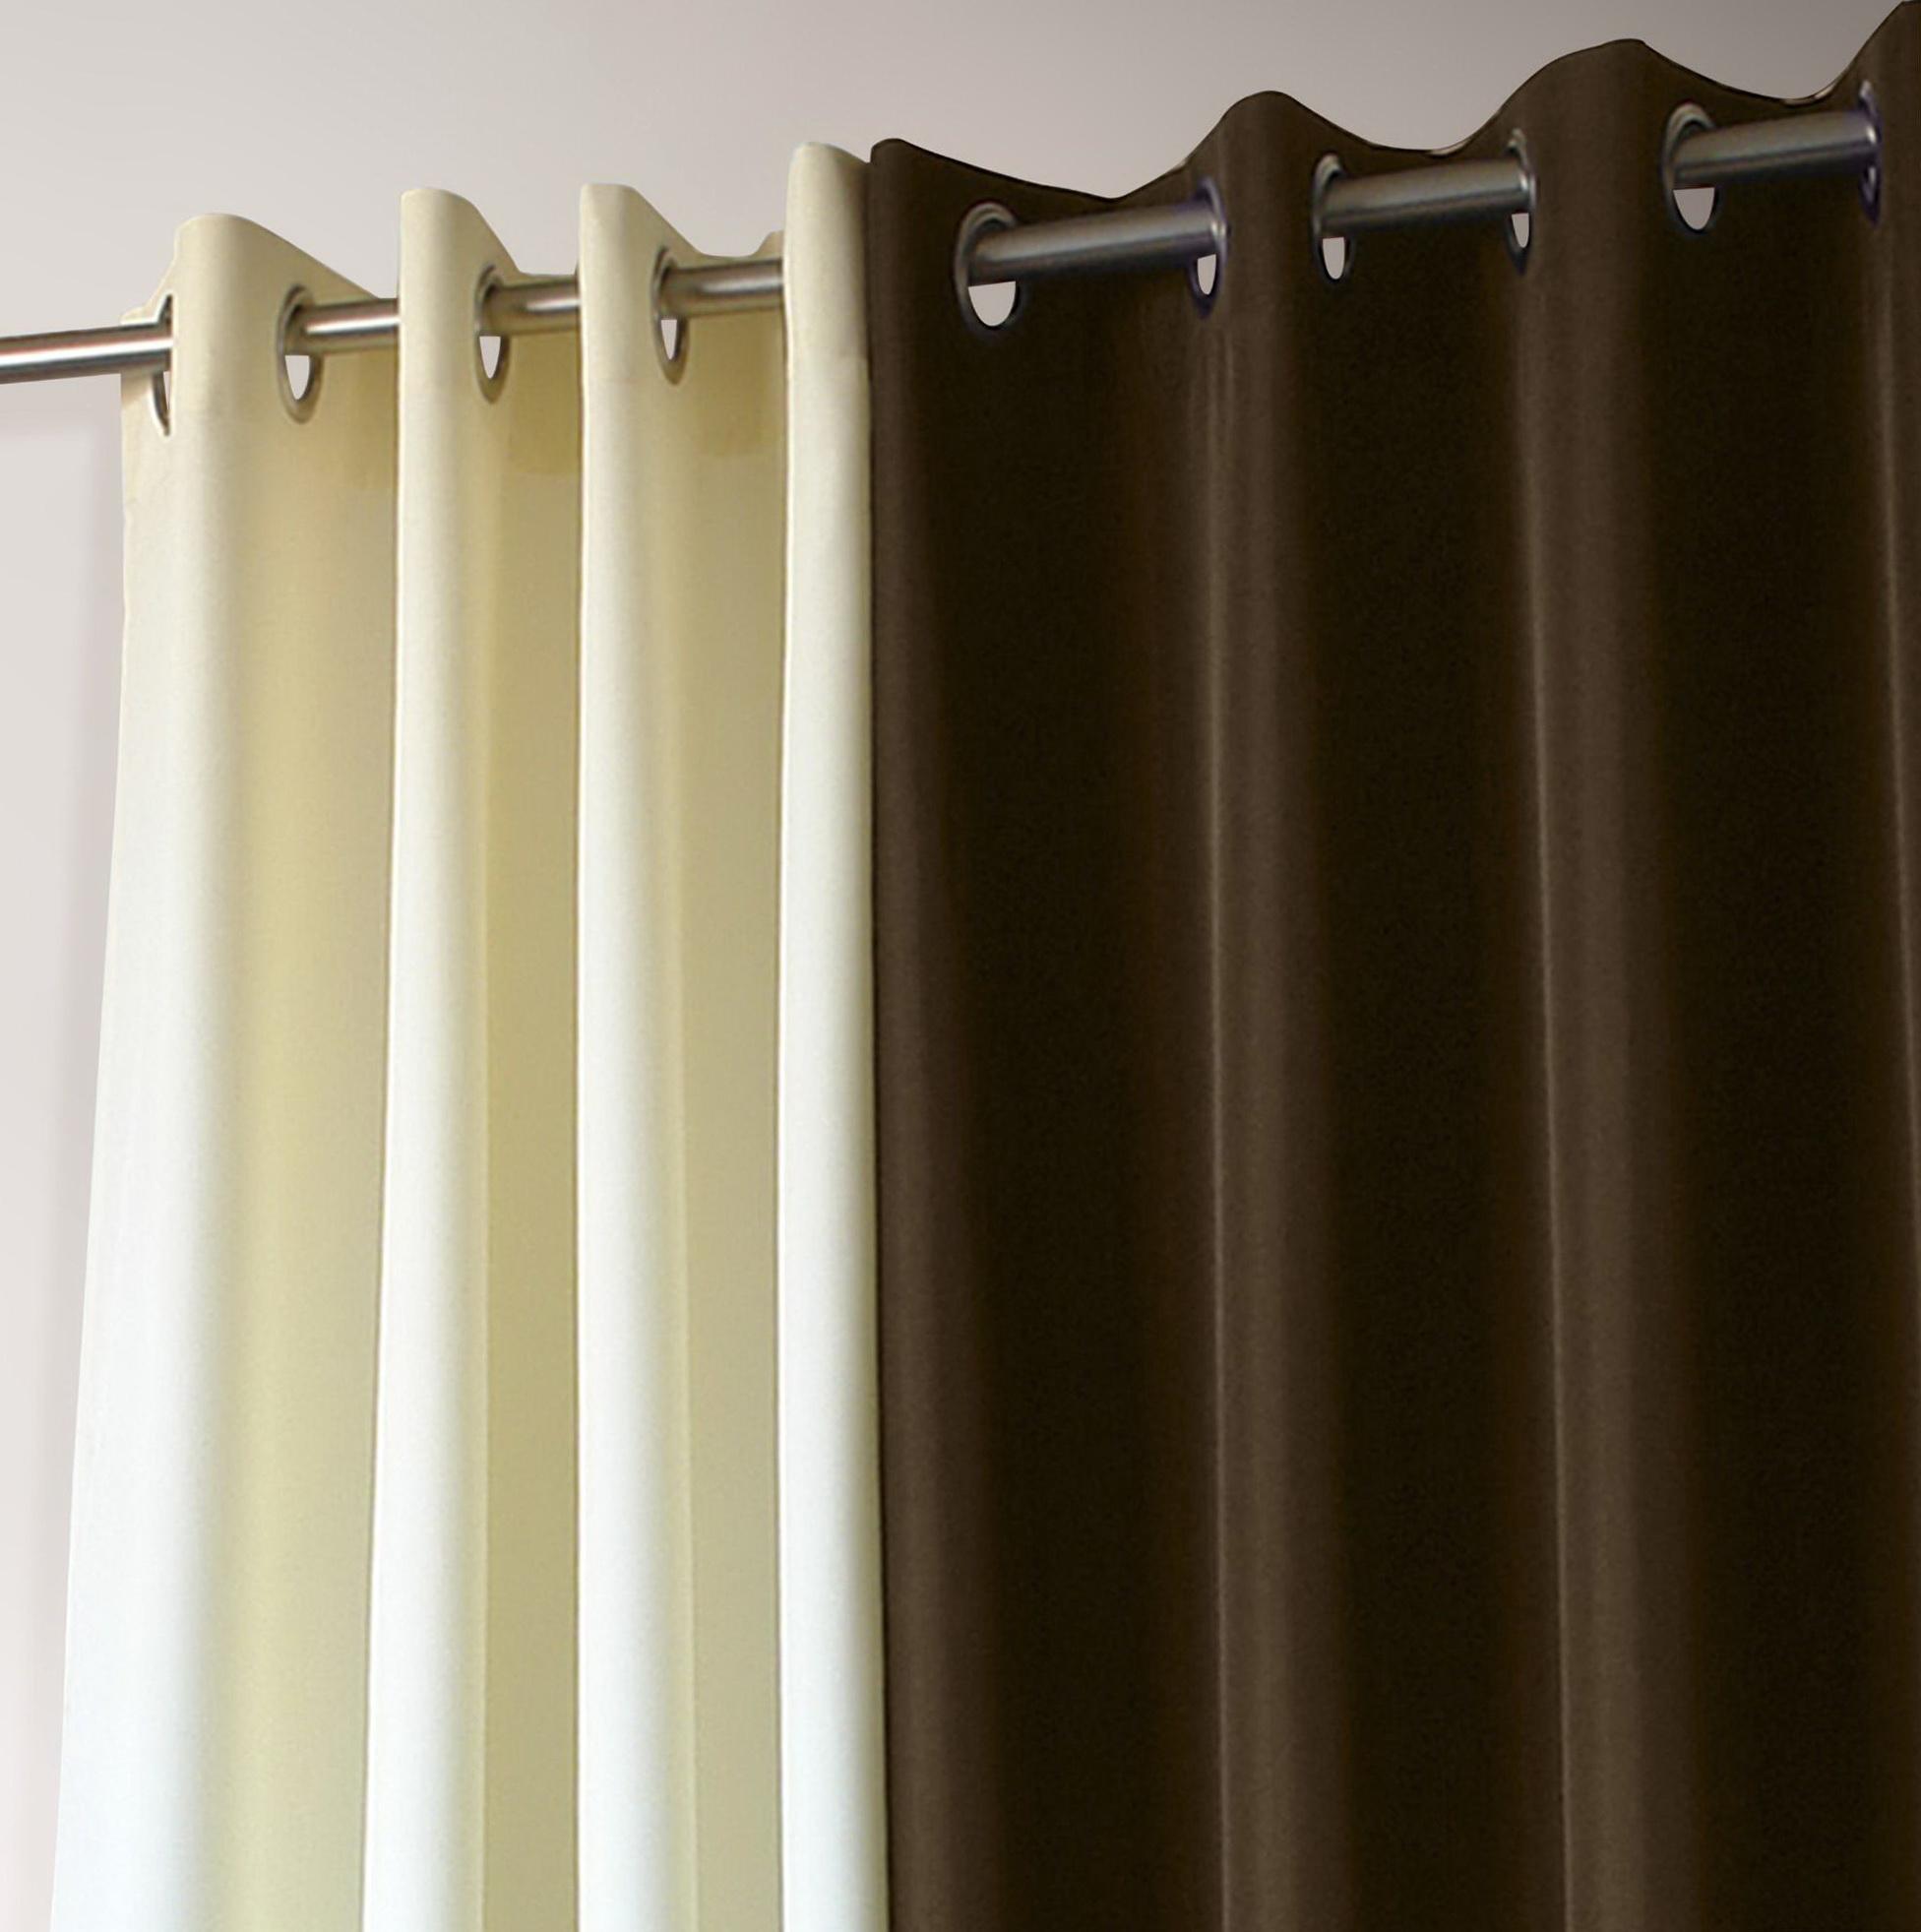 Best Curtain Rods For Grommet Panels